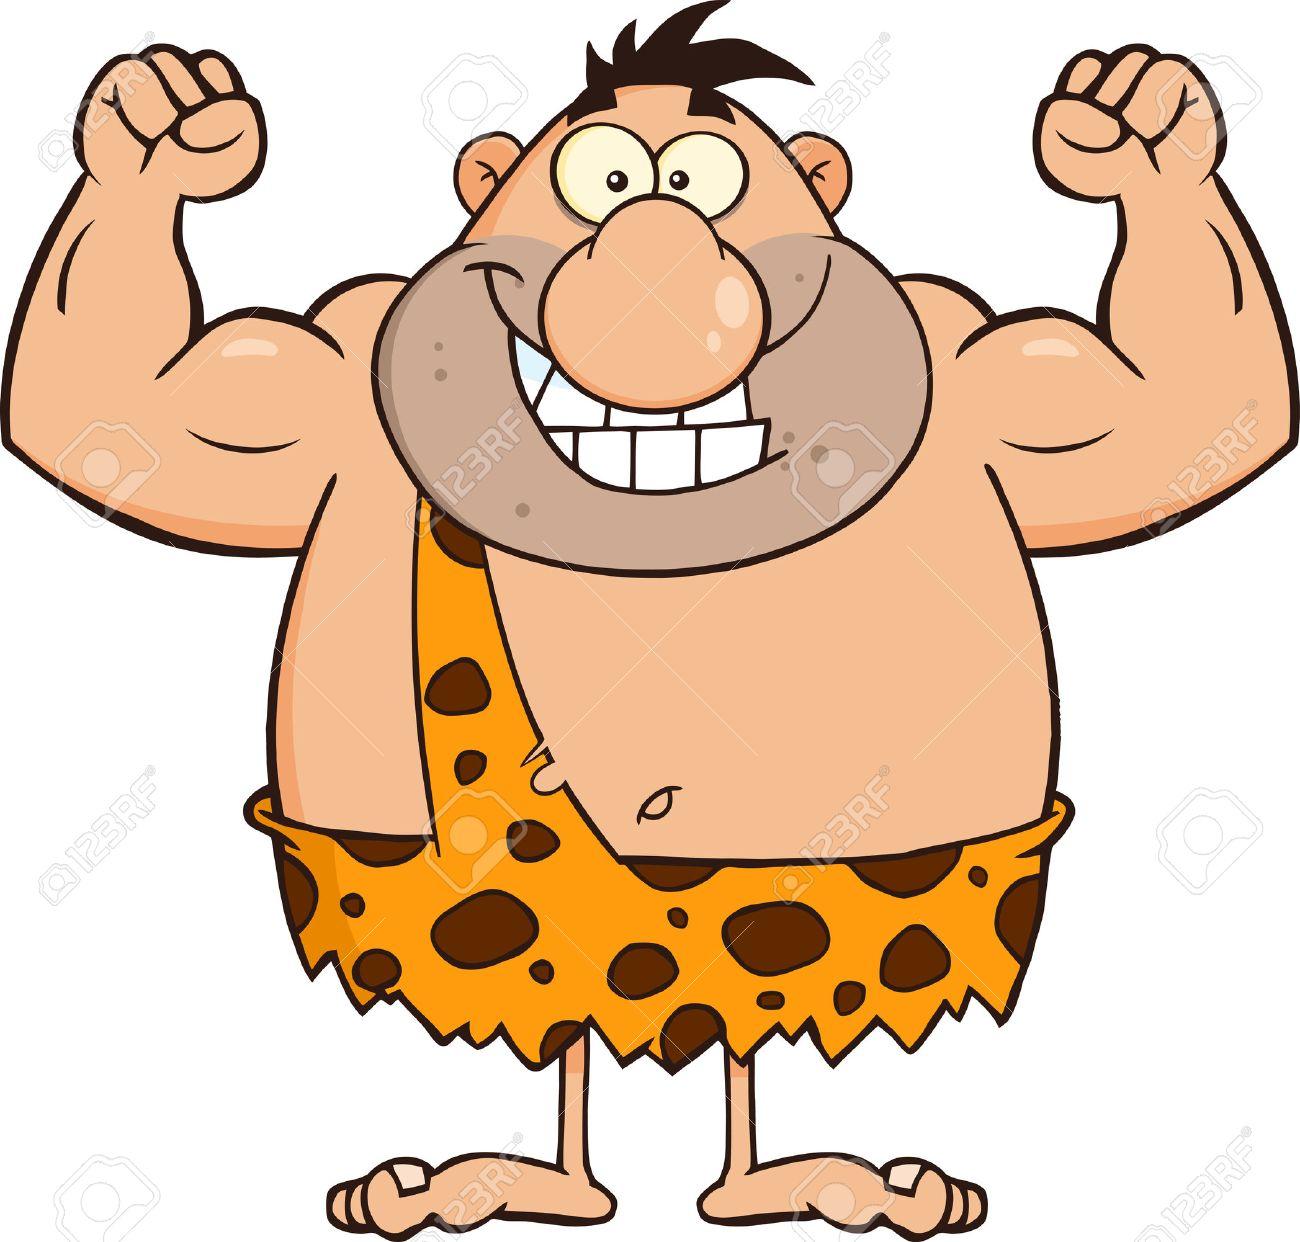 3 632 caveman stock vector illustration and royalty free caveman clipart rh 123rf com caveman clipart black and white clipart caveman wheel